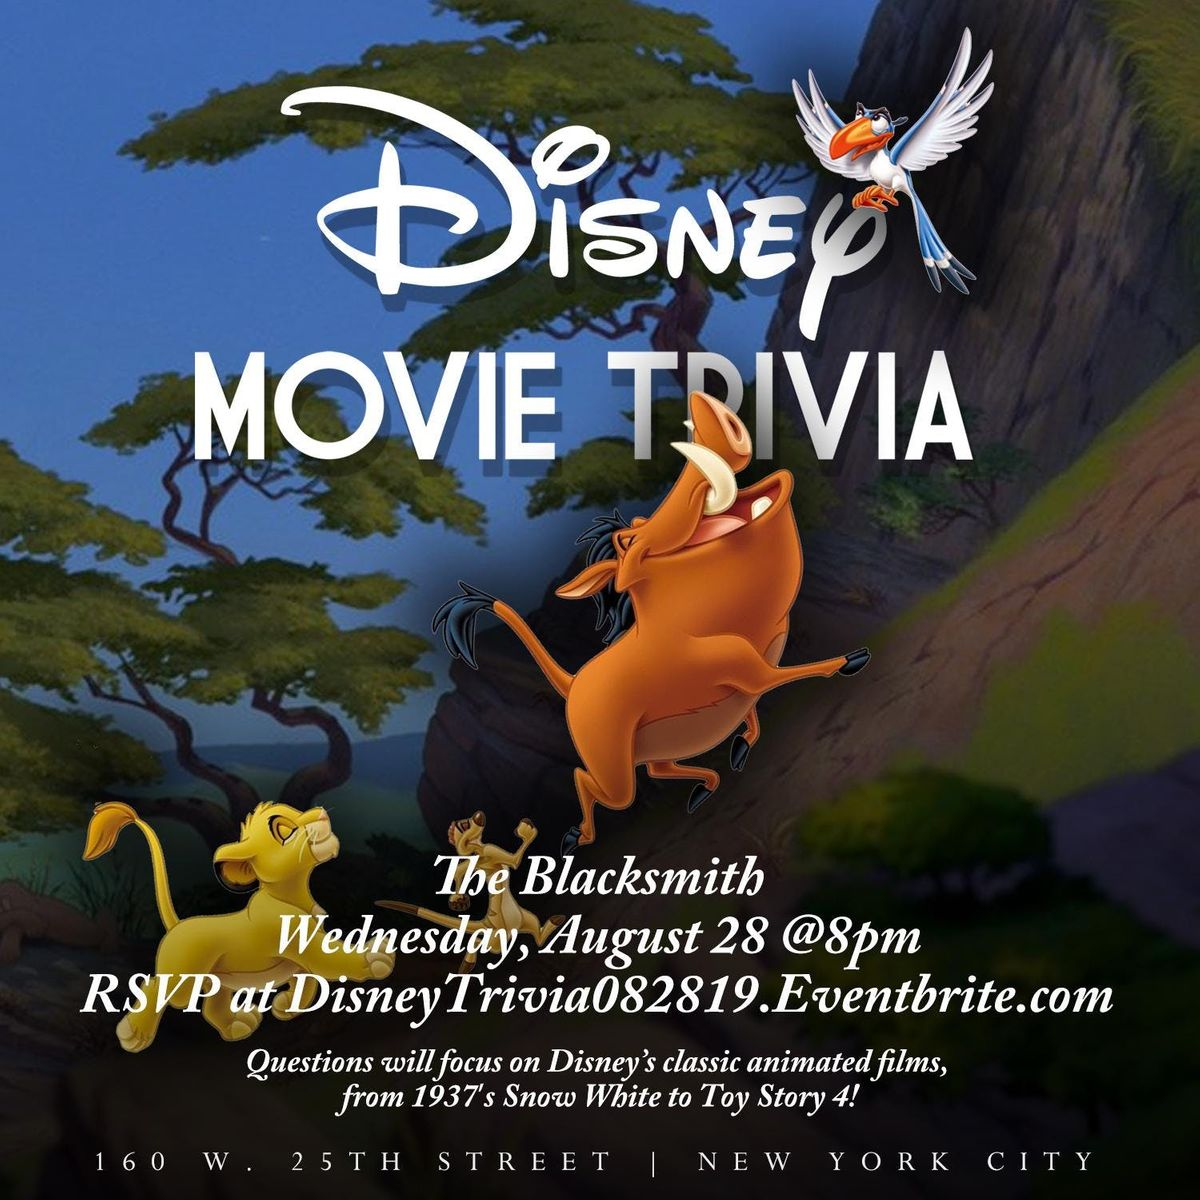 Disney (Movie) Trivia at The Blacksmith Bar and Kitchen, New